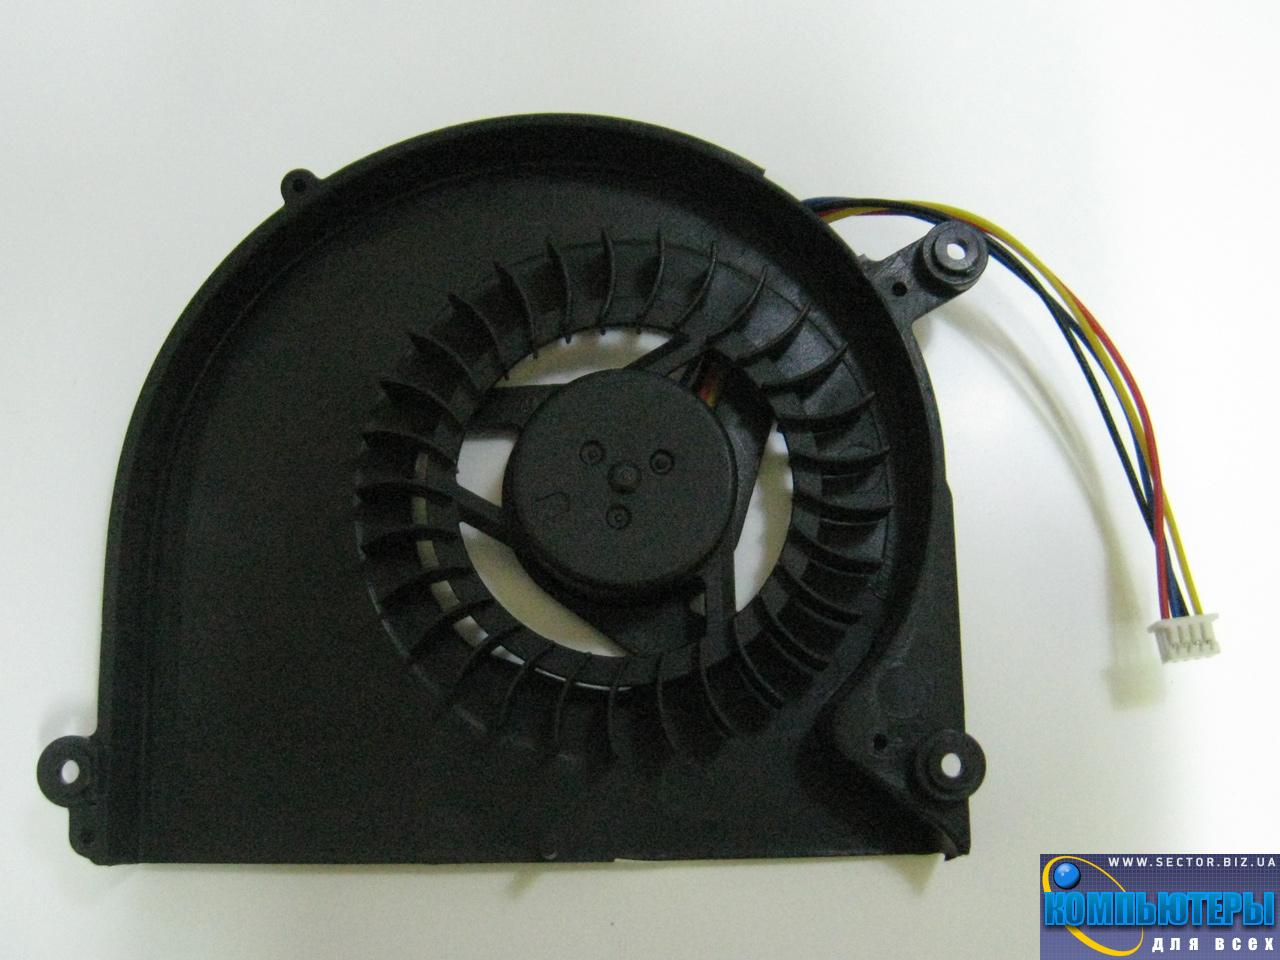 Кулер к ноутбуку Asus X5D X5DI X5DC X5DAF X5 K60 K61IC K70 K70AB K70C p/n: KDB0705HB. Фото № 3.